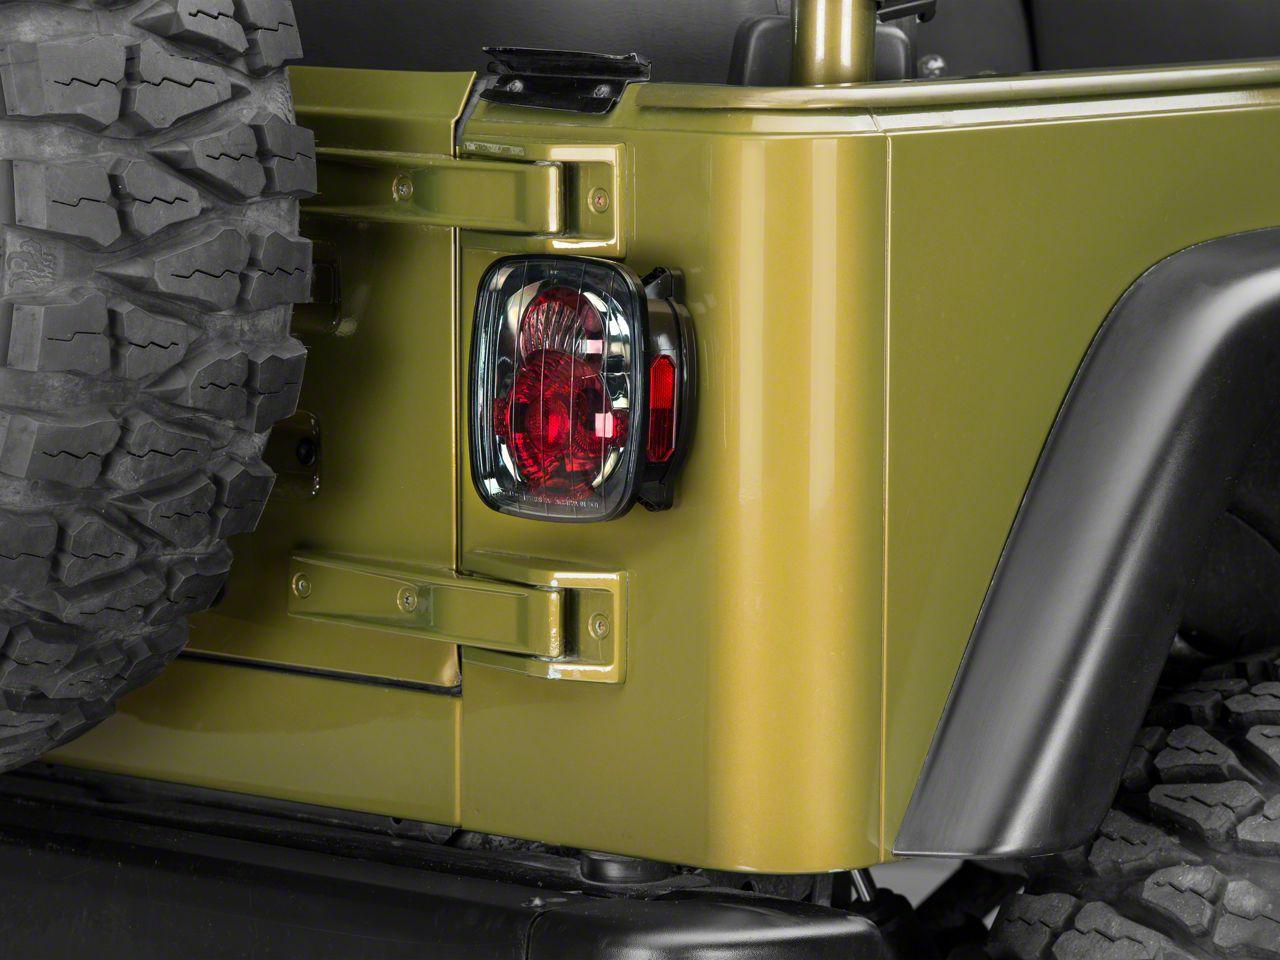 Axial Crystal Eyes Tail Lights - Platinum Smoke (87-06 Jeep Wrangler YJ, TJ)